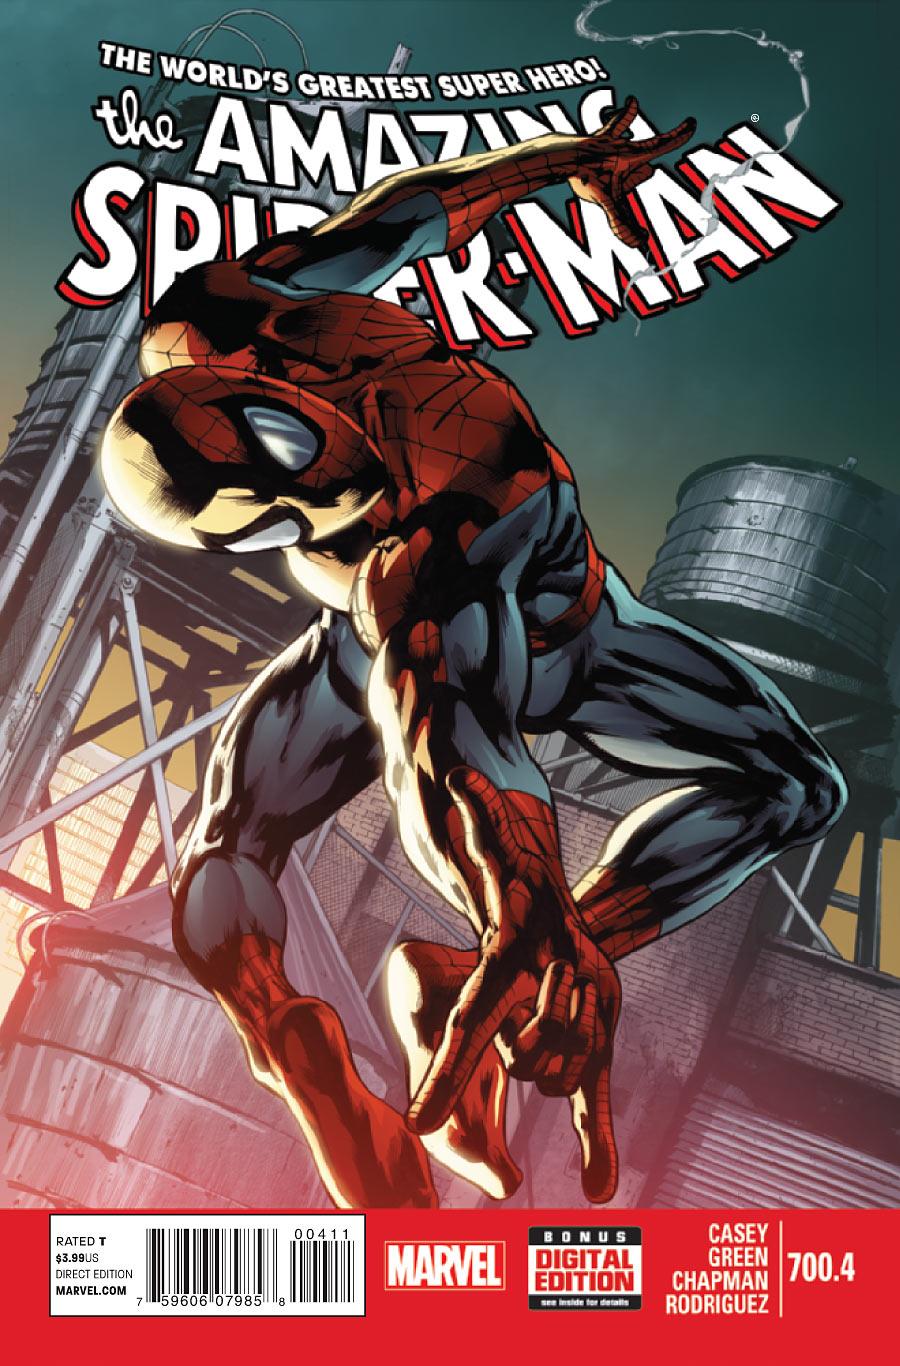 The Amazing Spider-Man #700.4